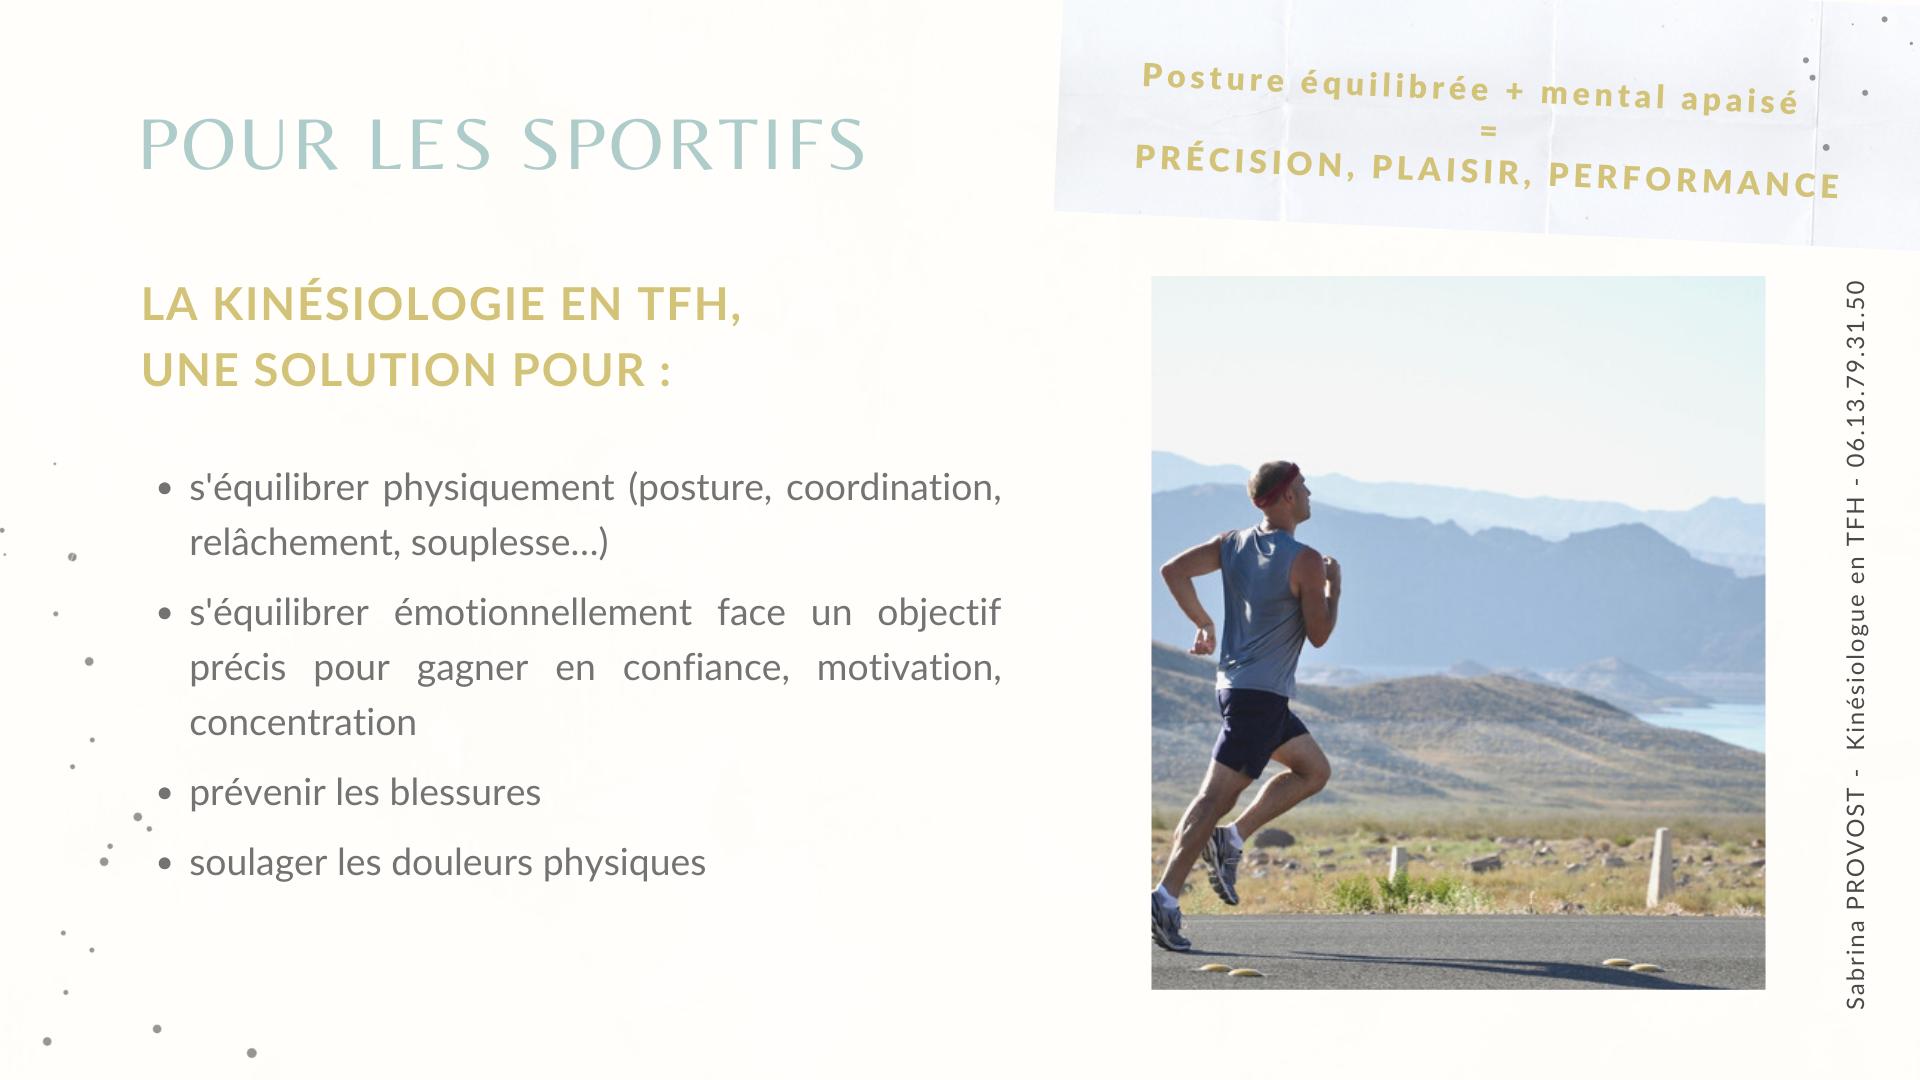 La kinésiologie en TFH, pour les sportifs